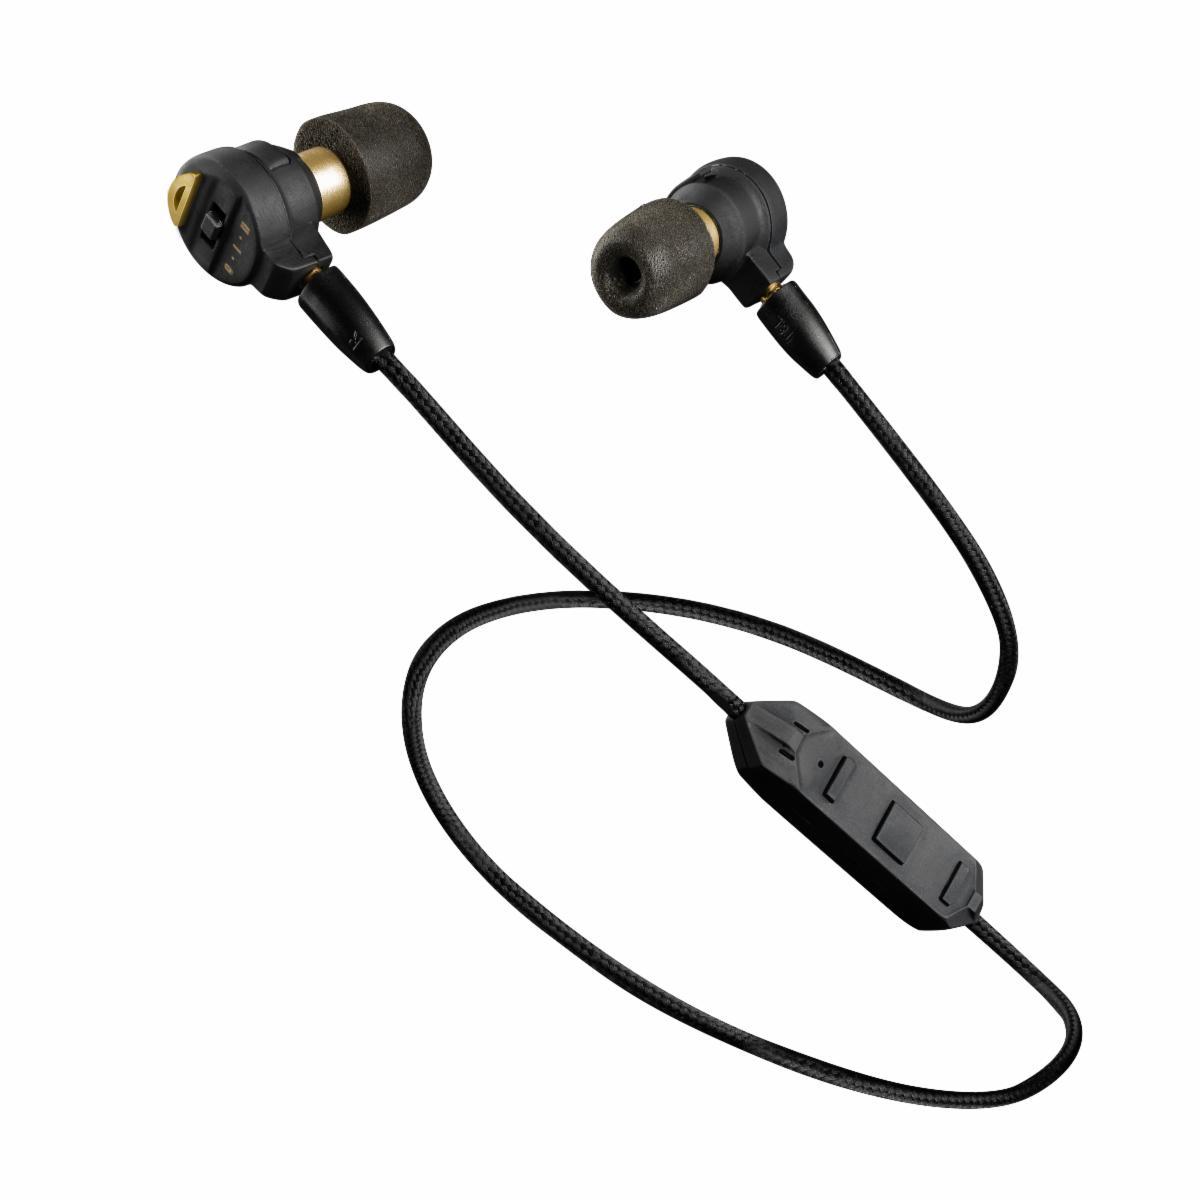 Pro Ears Stealth Elite Bluetooth Electronic Ear Buds